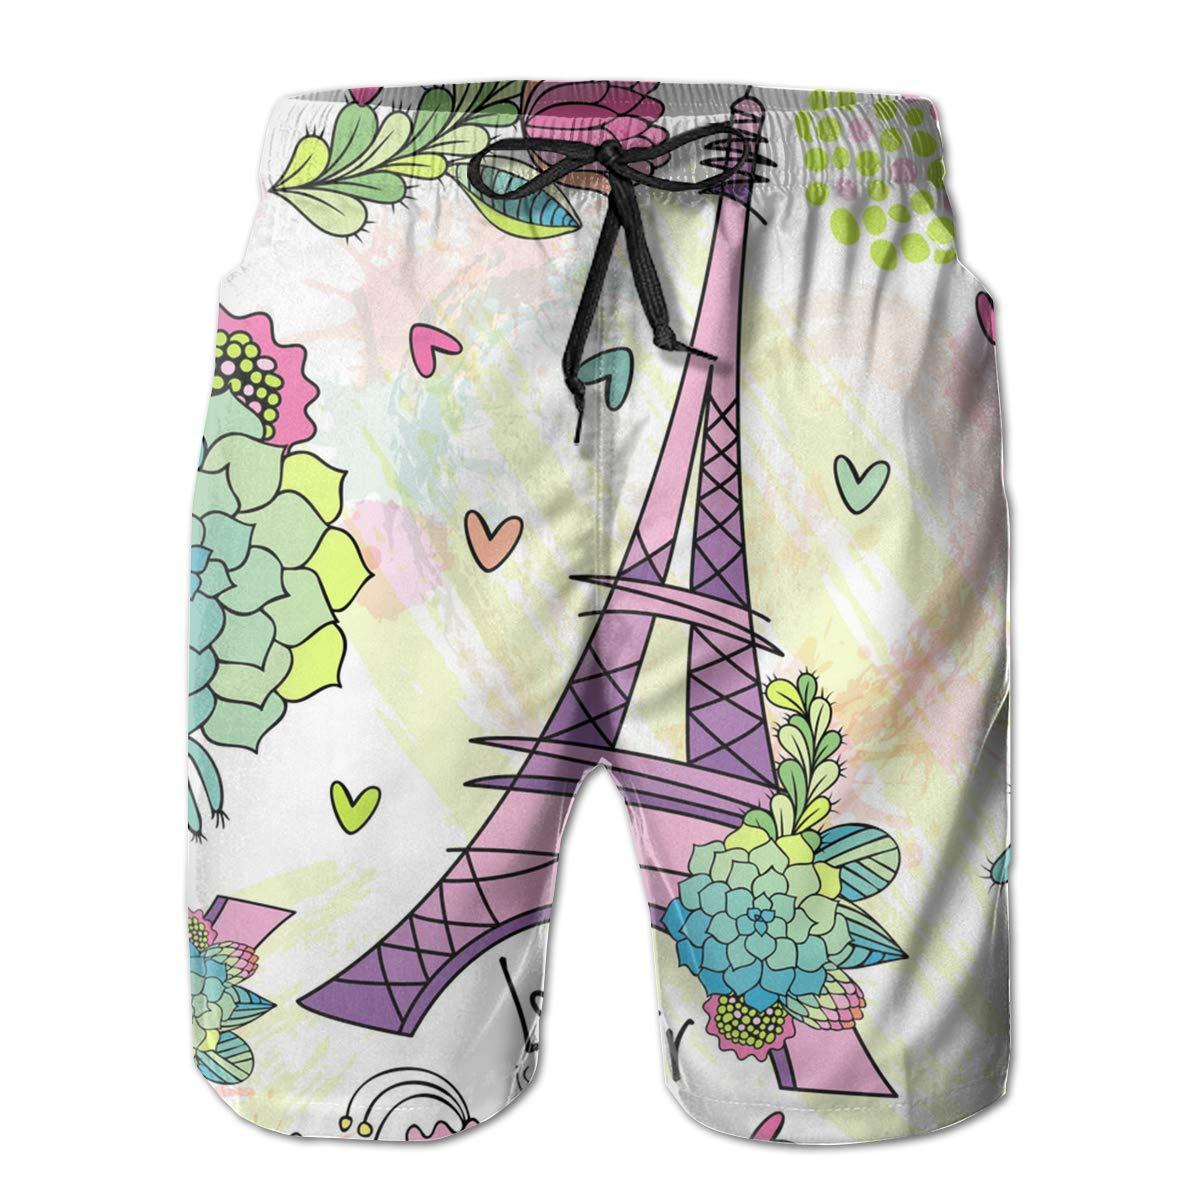 SARA NELL Mens Swim Trunks Floral Pattern with Eiffel Tower Surfing Beach Board Shorts Swimwear